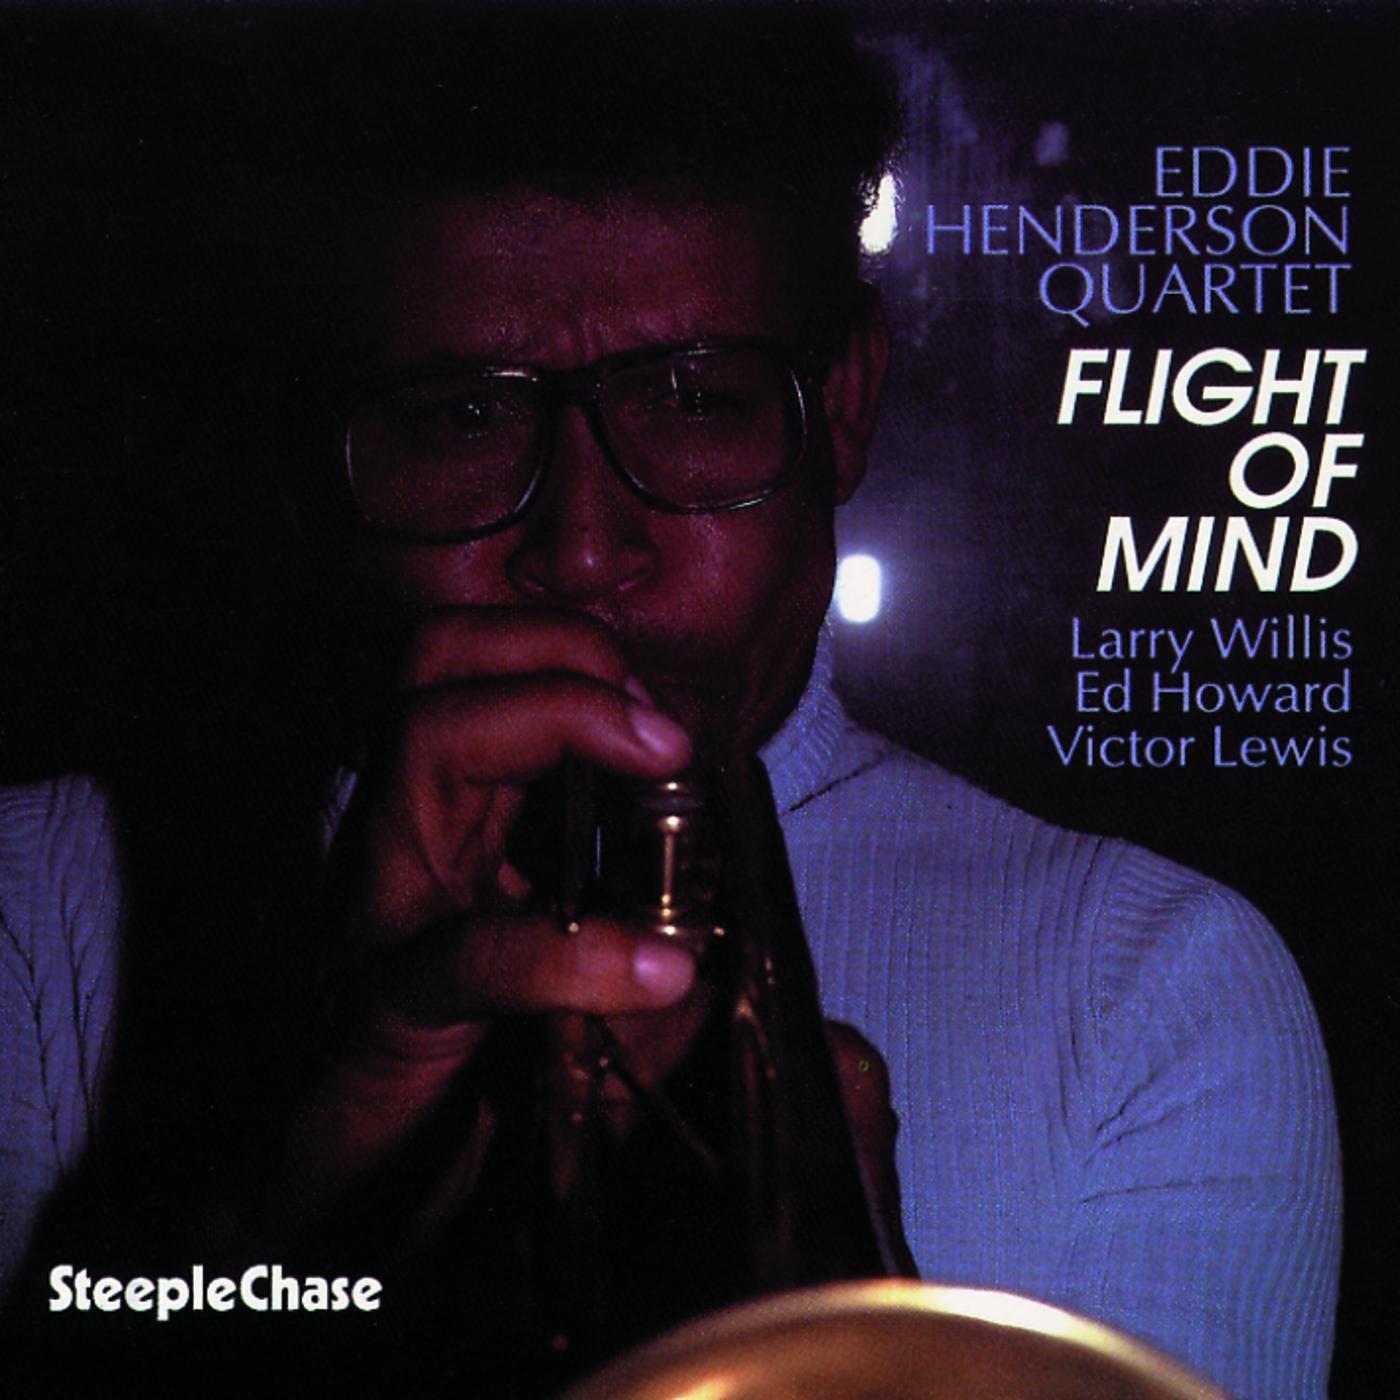 Flight Of Mind